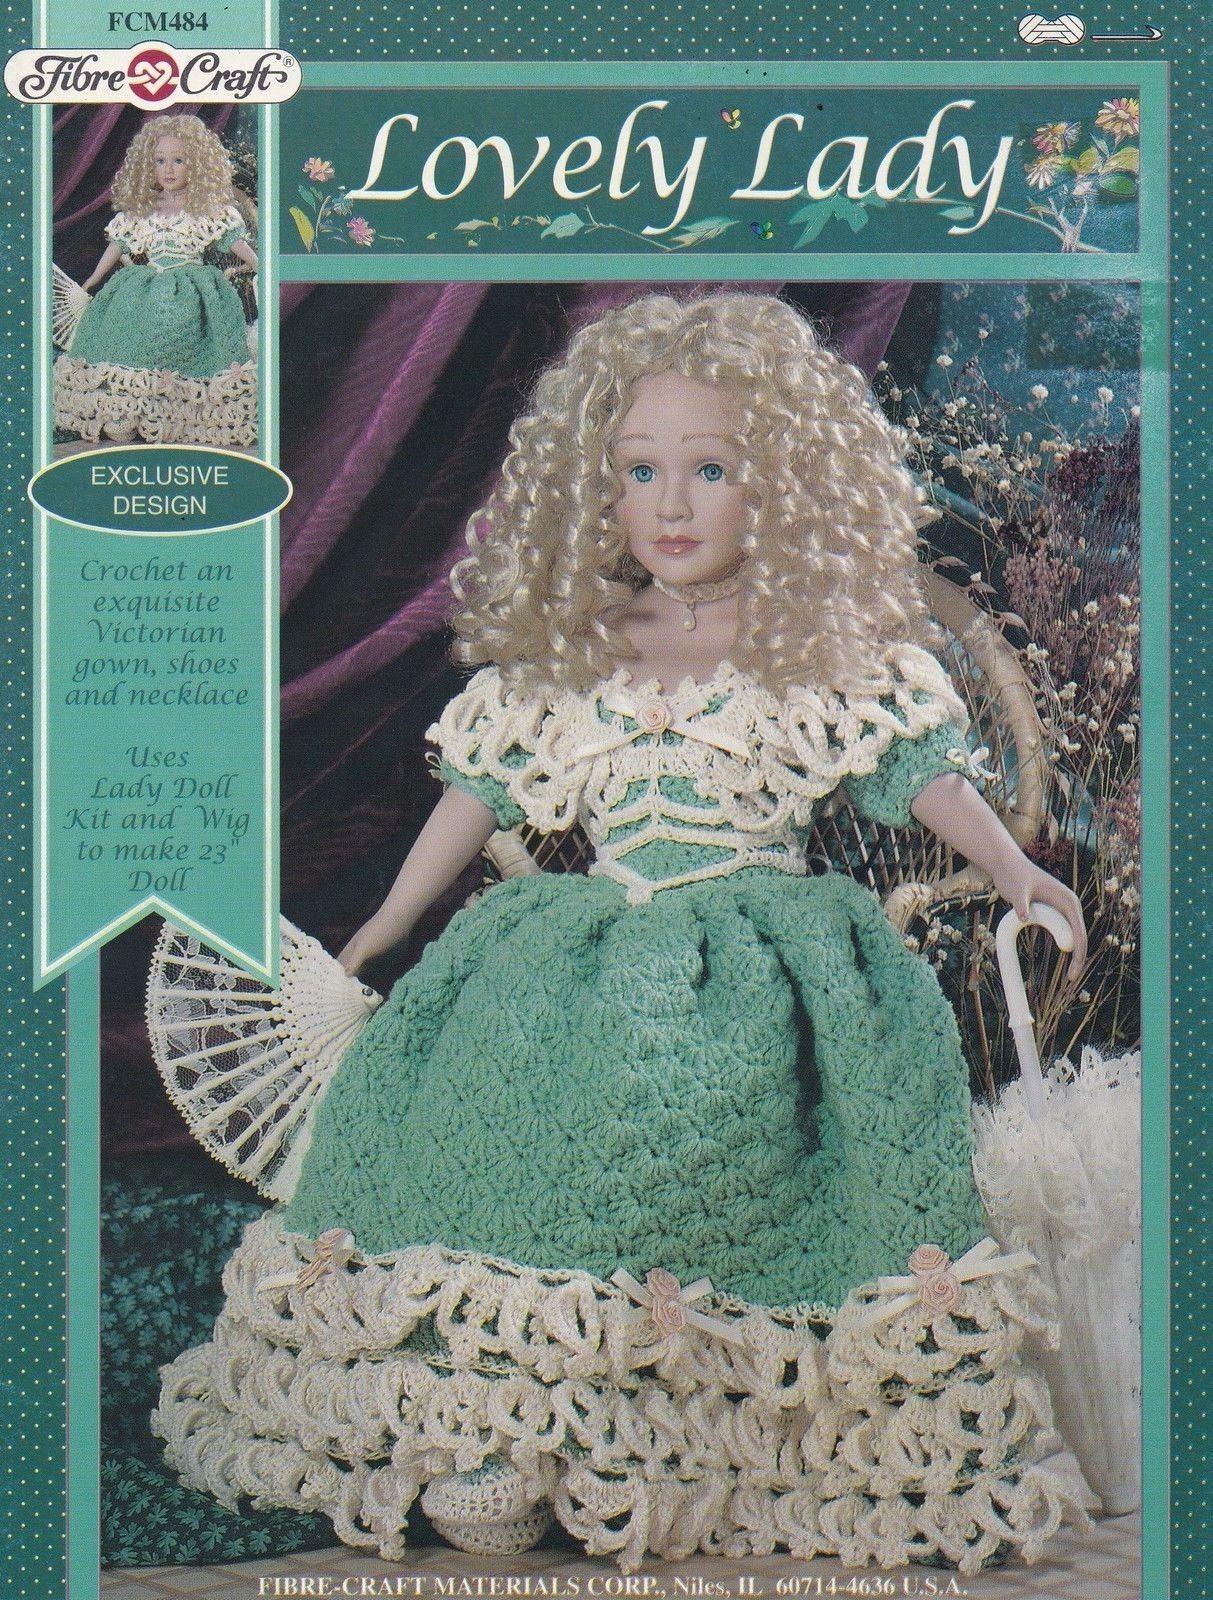 "Lovely Lady Fibre Craft 23"" Doll Clothes Crochet Pattern Leaflet FCM484"